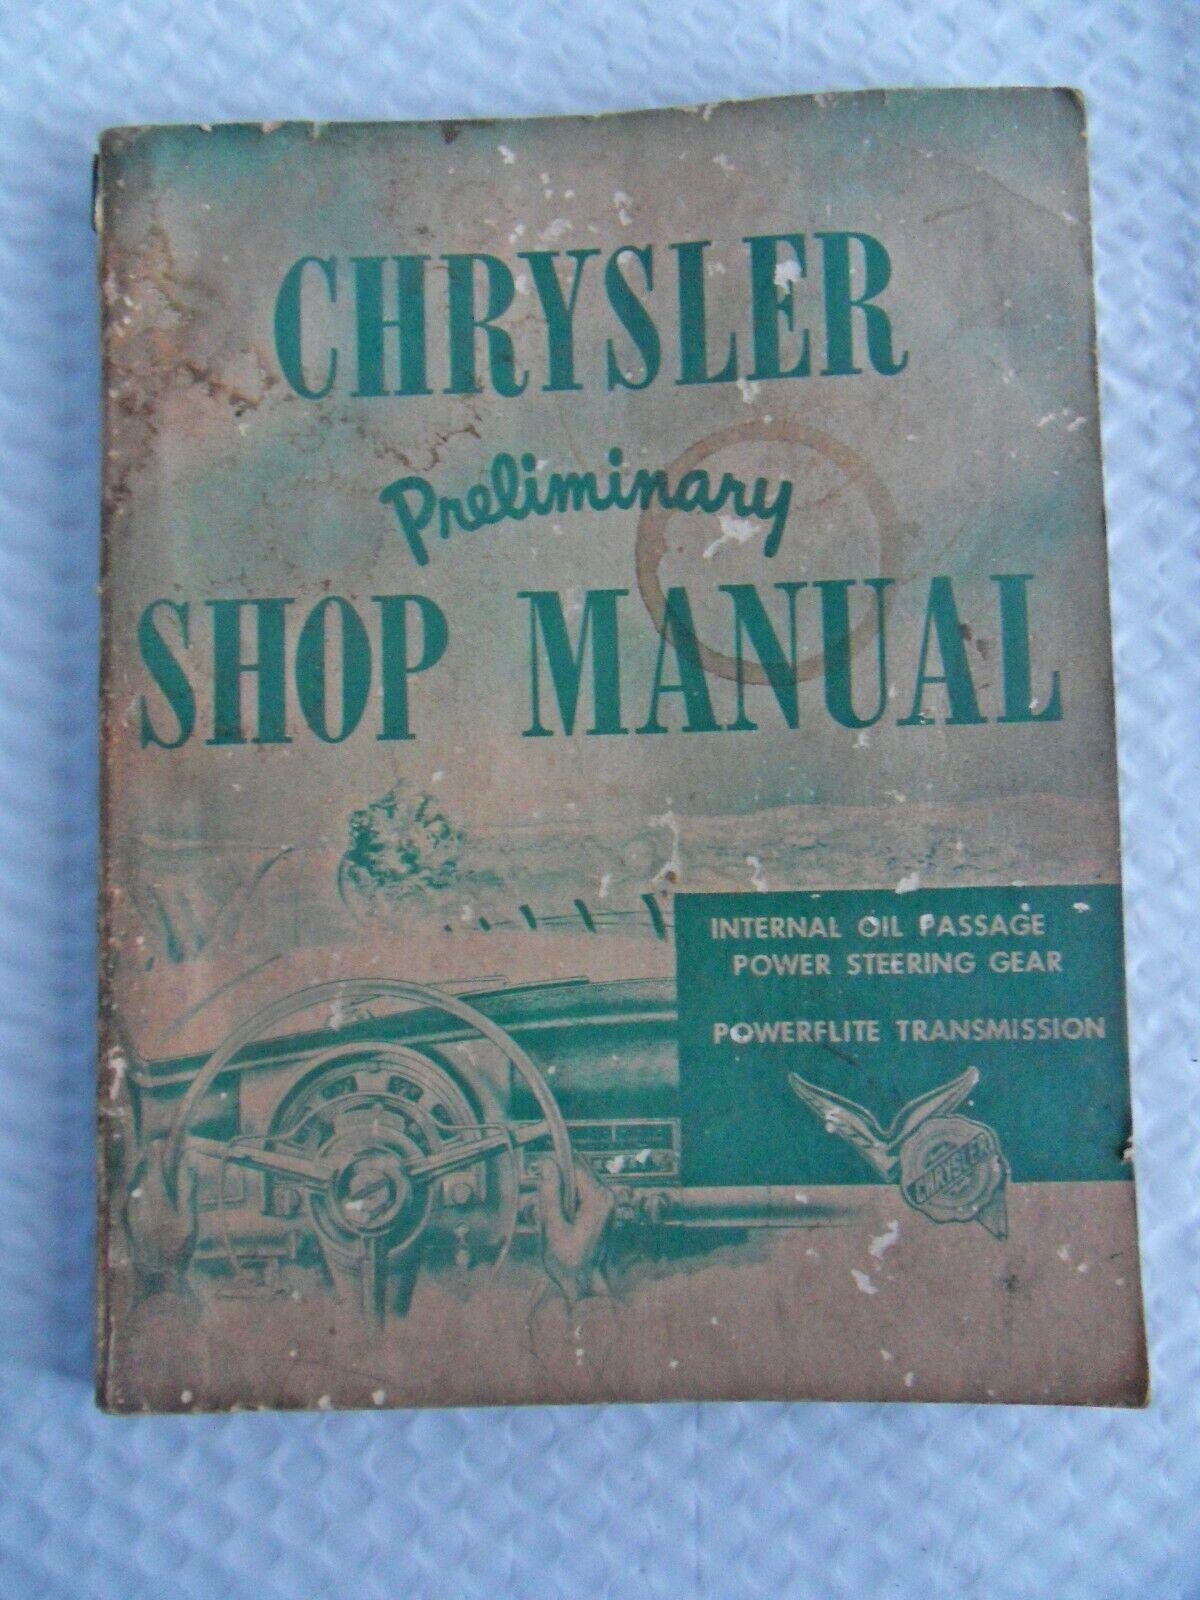 Vintage Chrysler Preliminary Shop Manual.D-14581 Powerflite Trans, Steering Gear